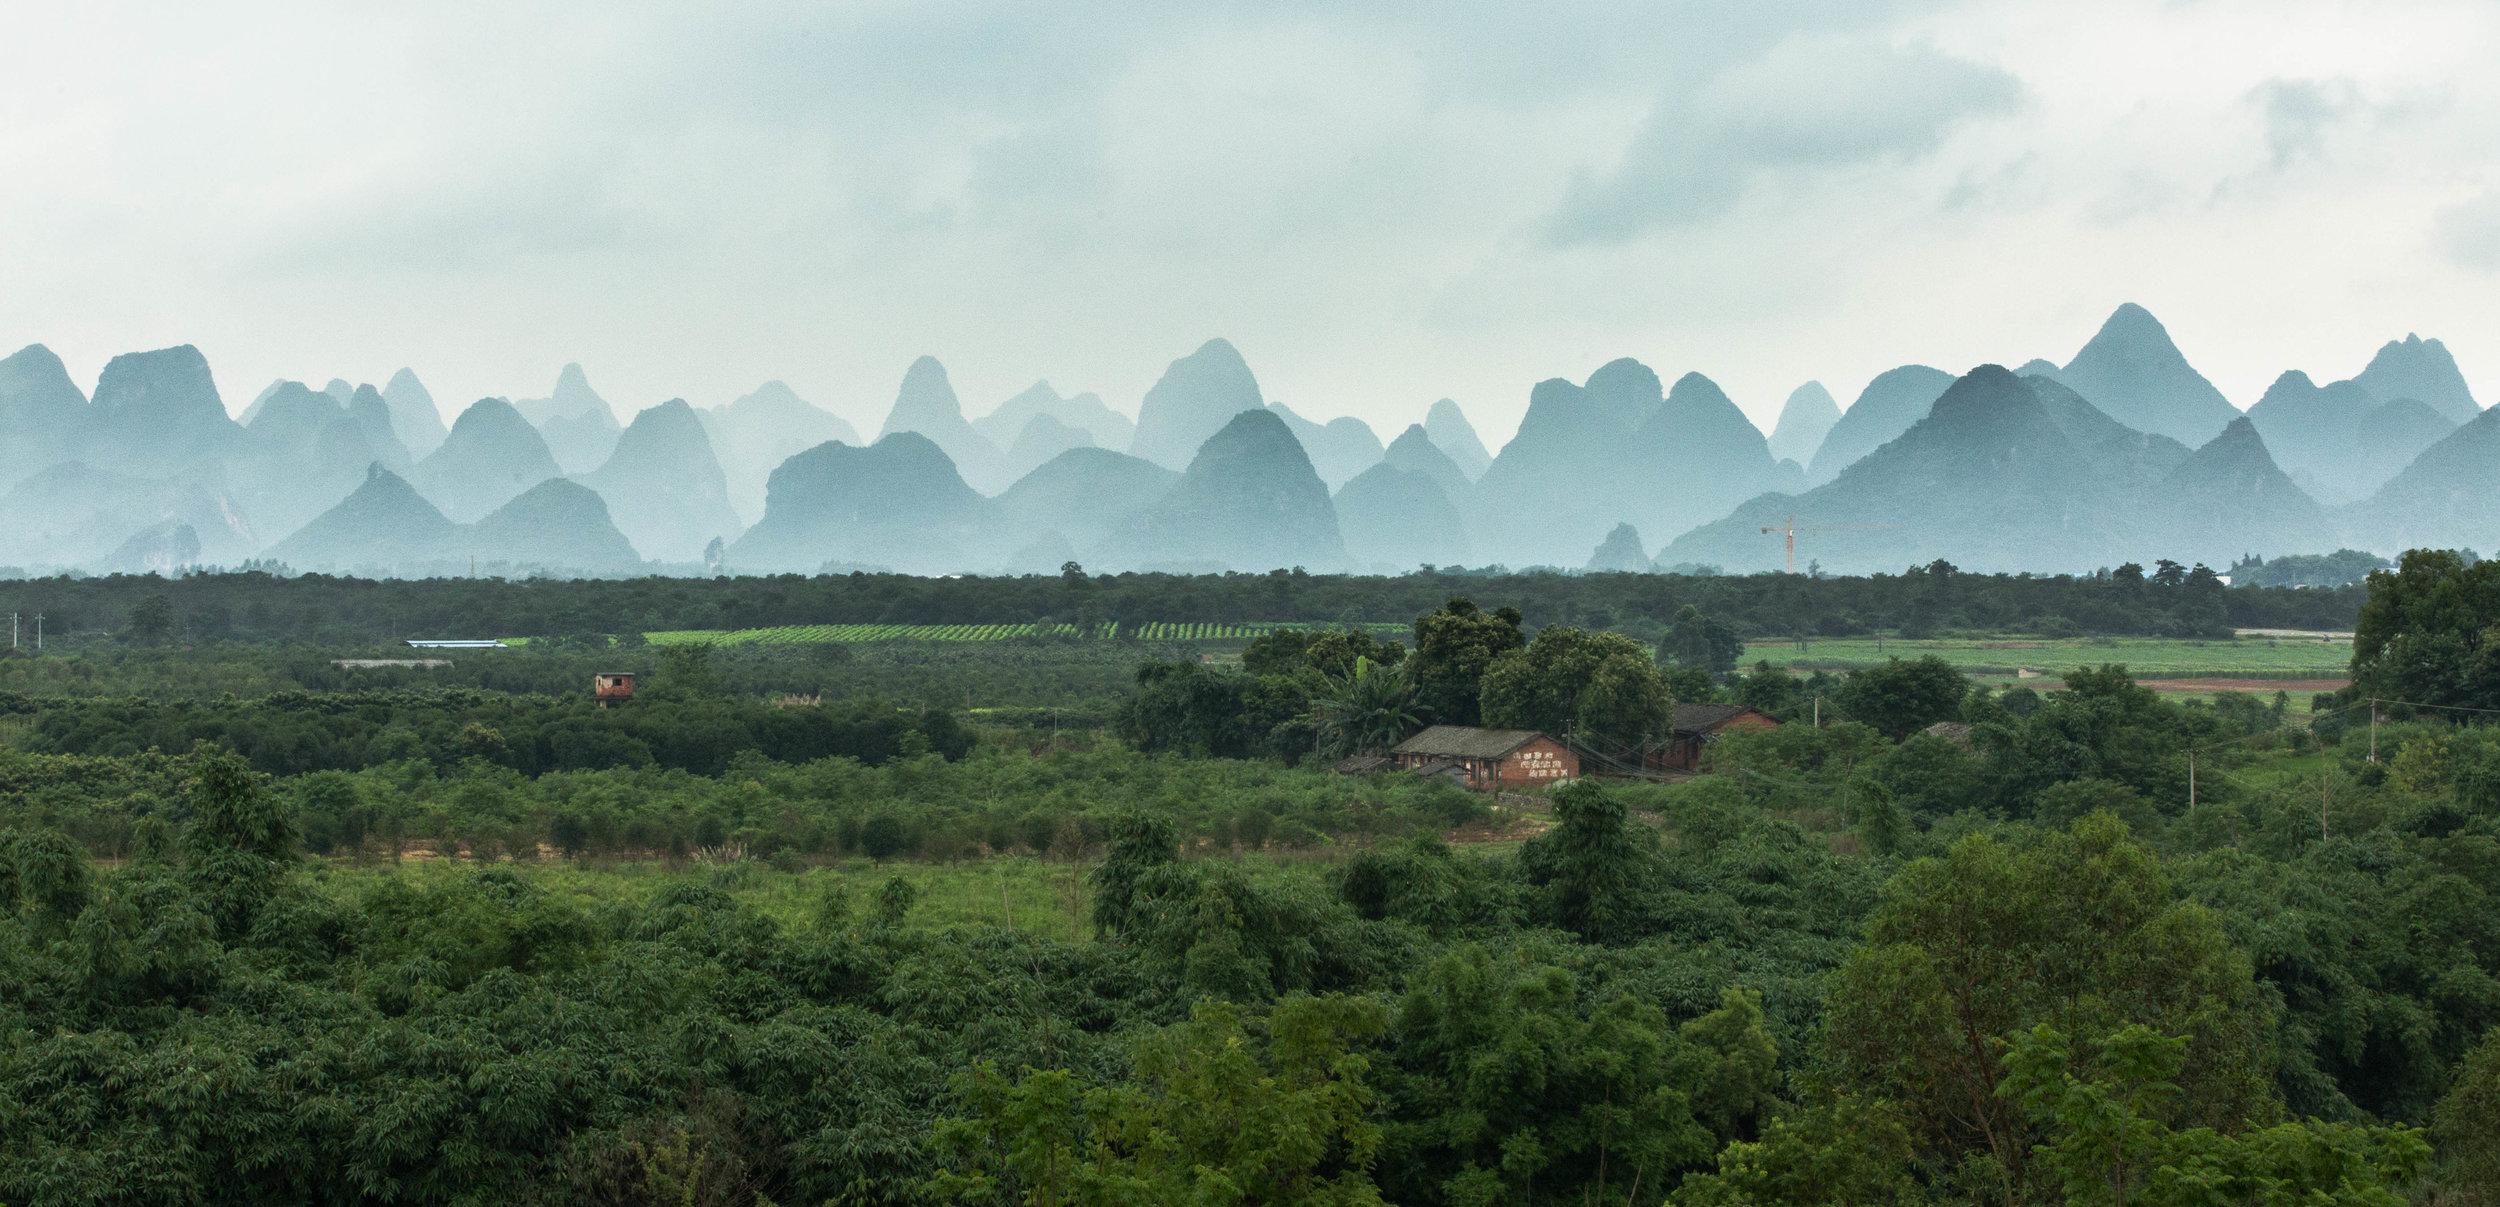 Guilin Mountain view 2 (1 of 1).jpg